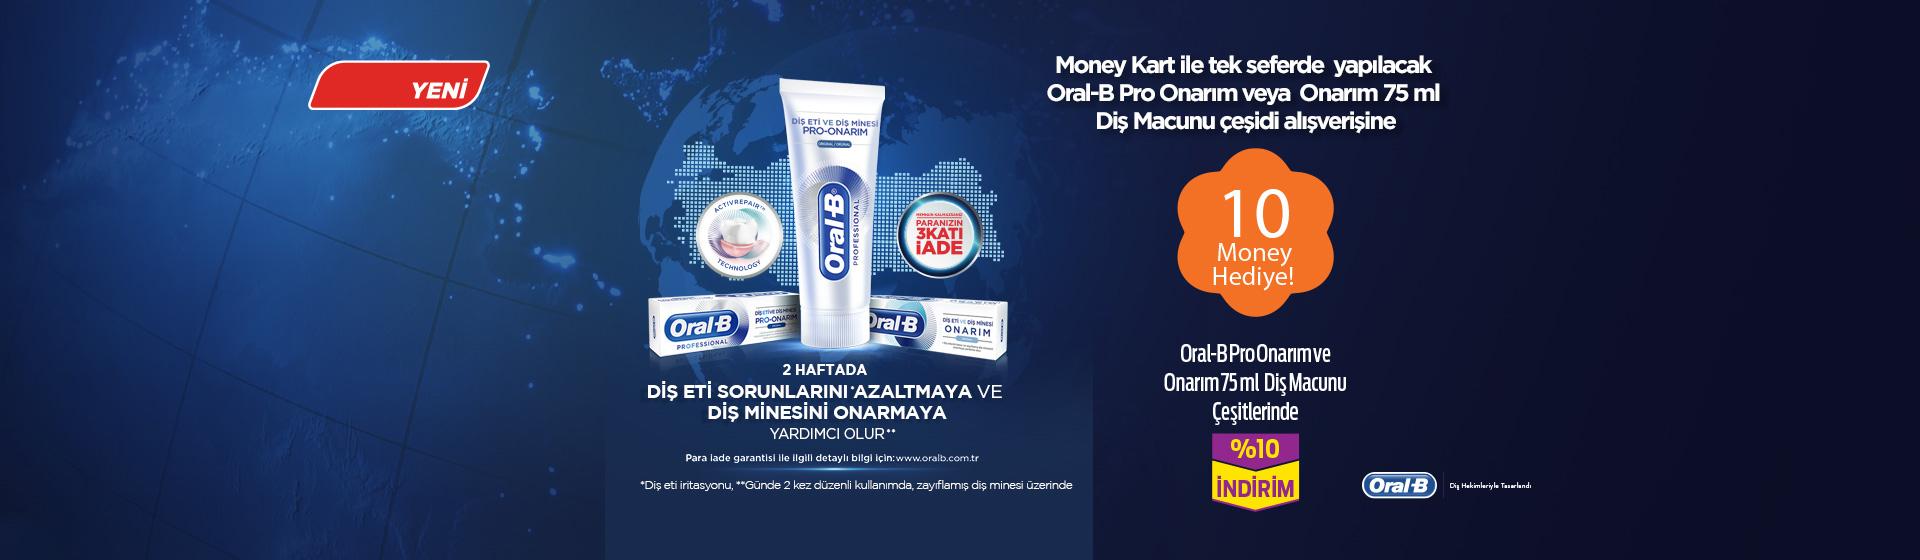 Oral-B Money Kampanyası